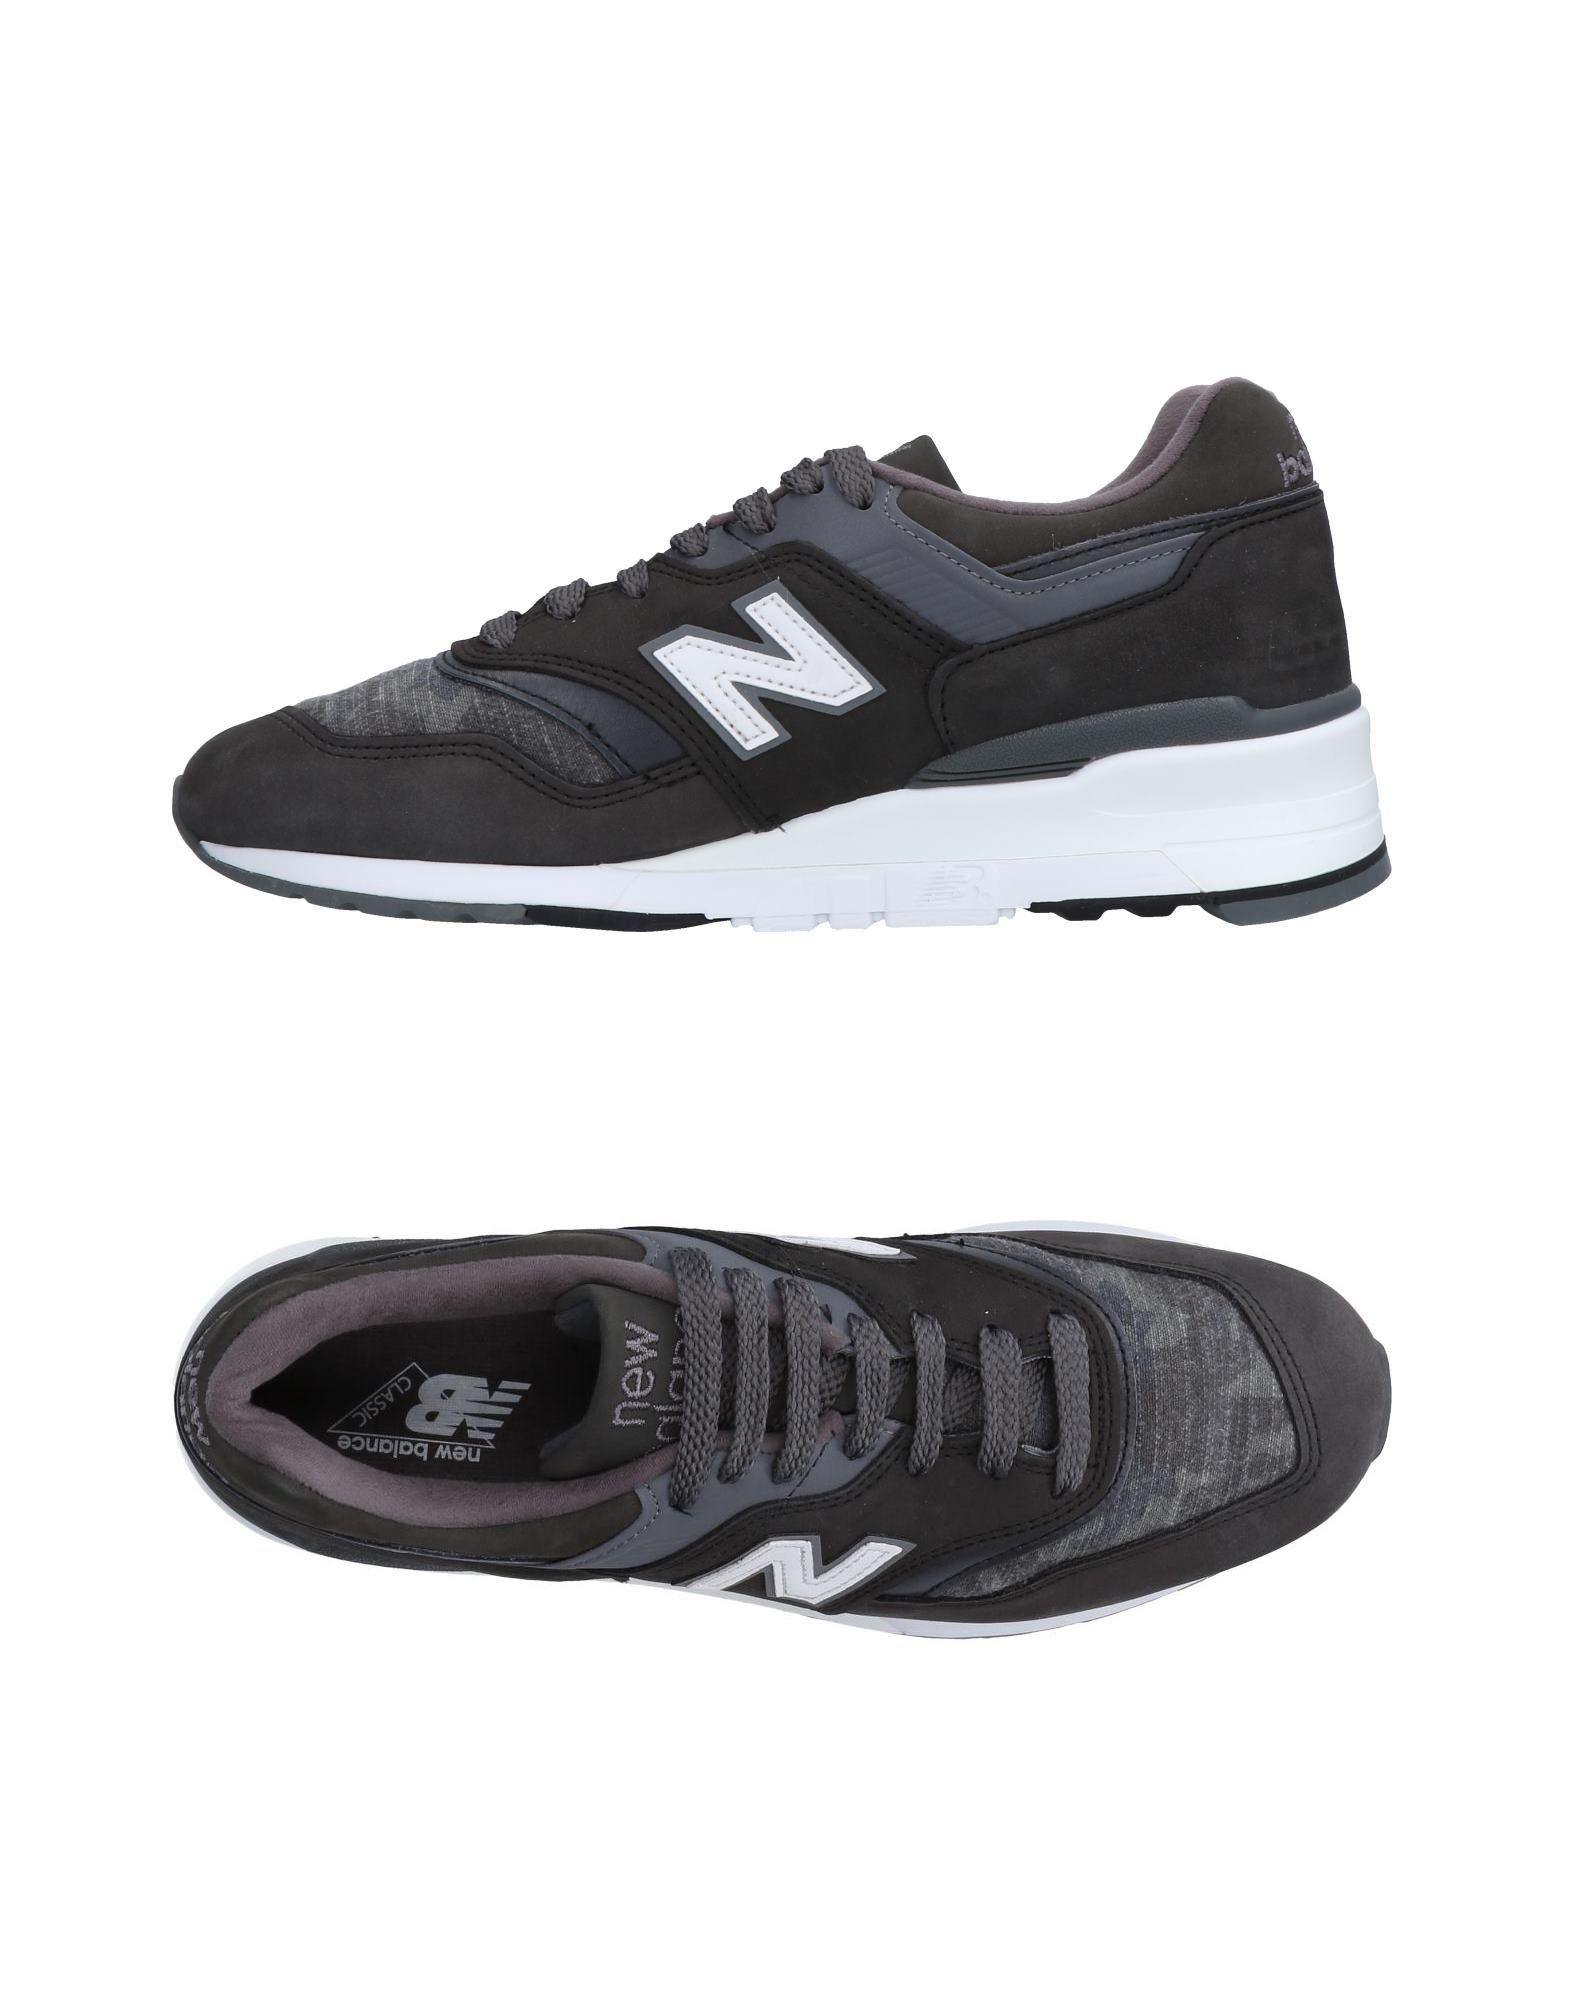 New Balance Sneakers Herren  11512469FQ Gute Qualität beliebte Schuhe